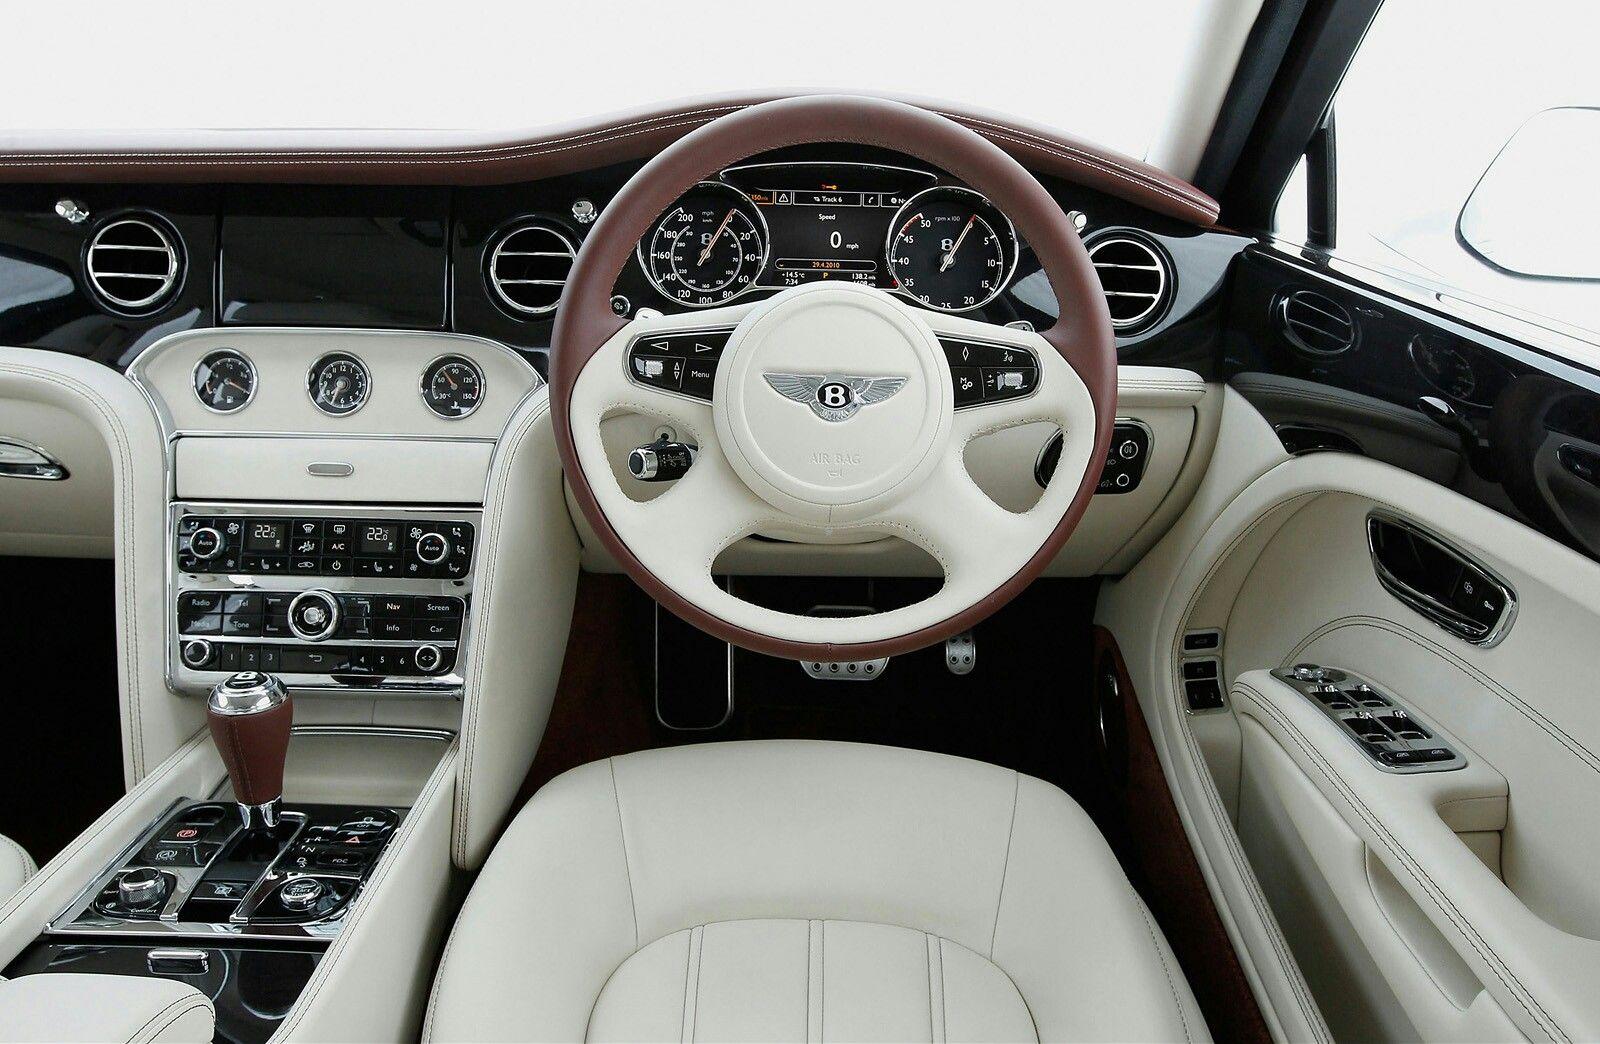 2012 Bentley Mulsanne Diamond Jubilee Edition   Bentley   Pinterest ...